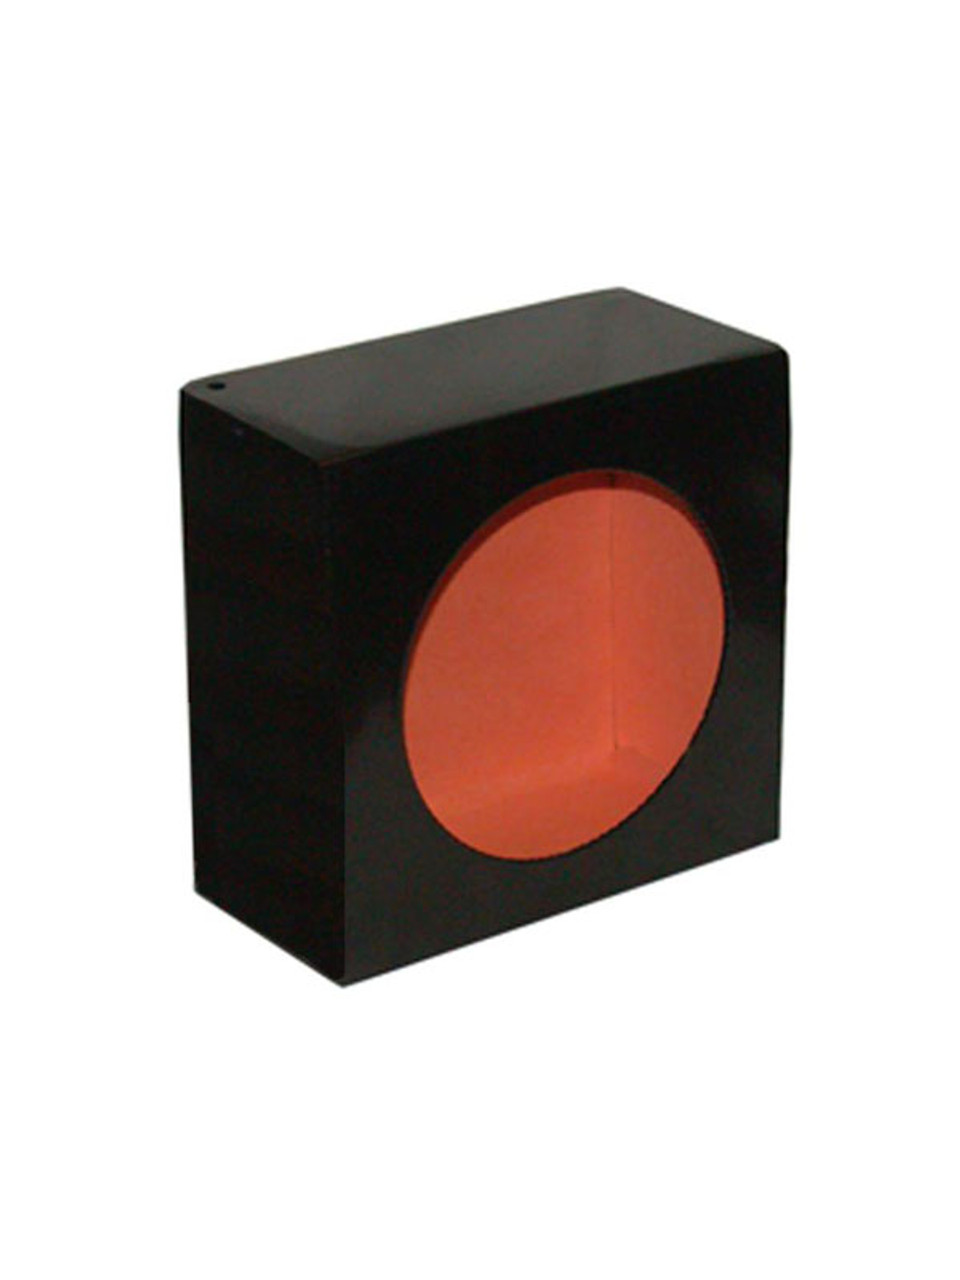 LB663 --- Black Round Tail Light Guard Box